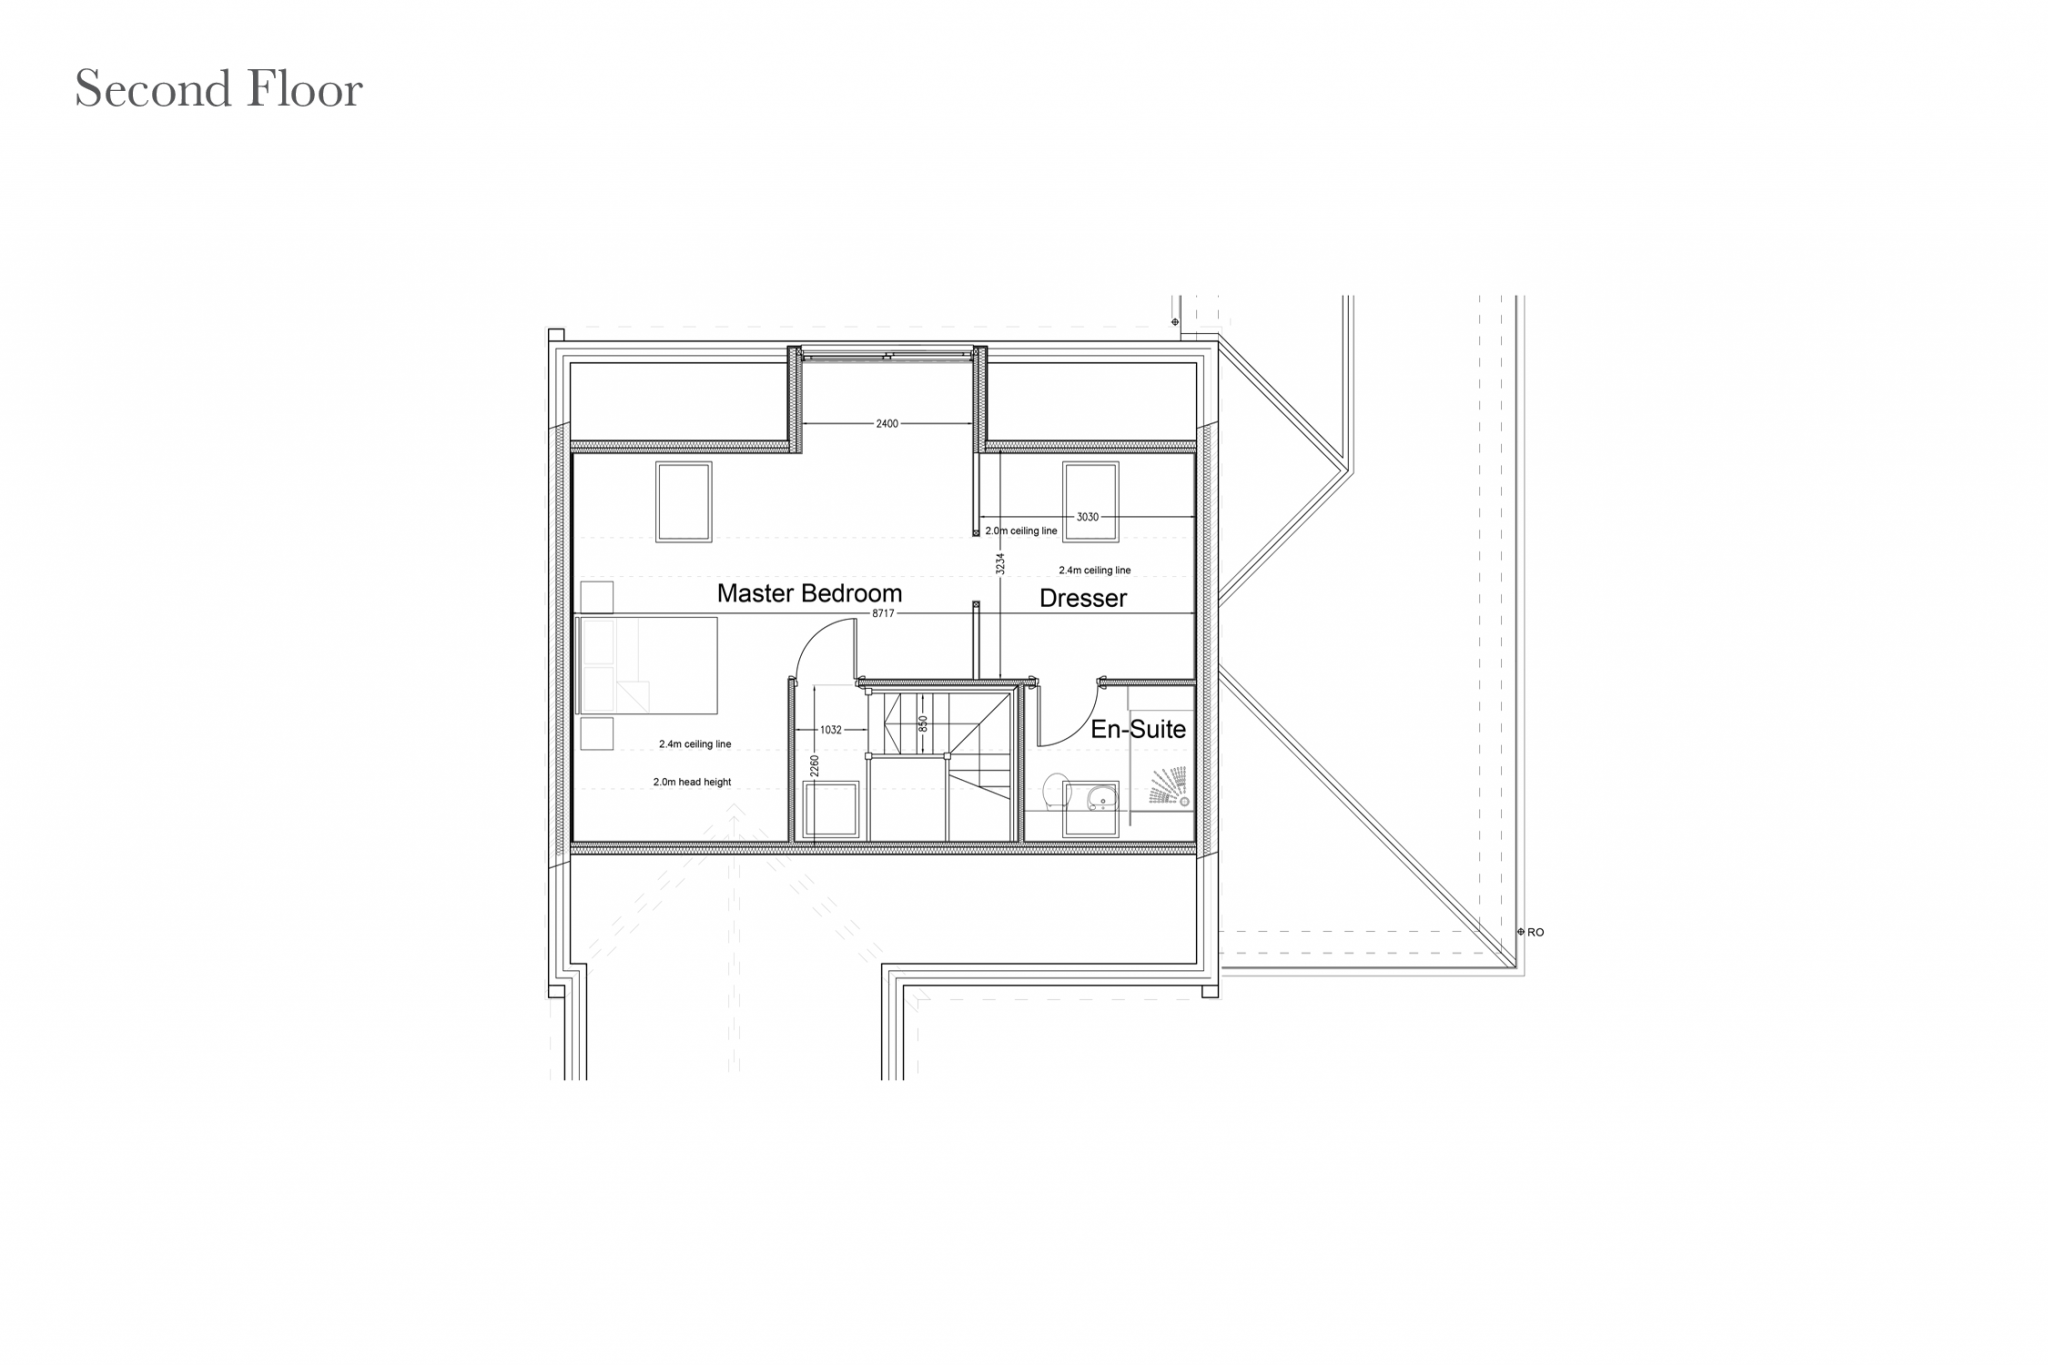 Plot 2 Second Floor